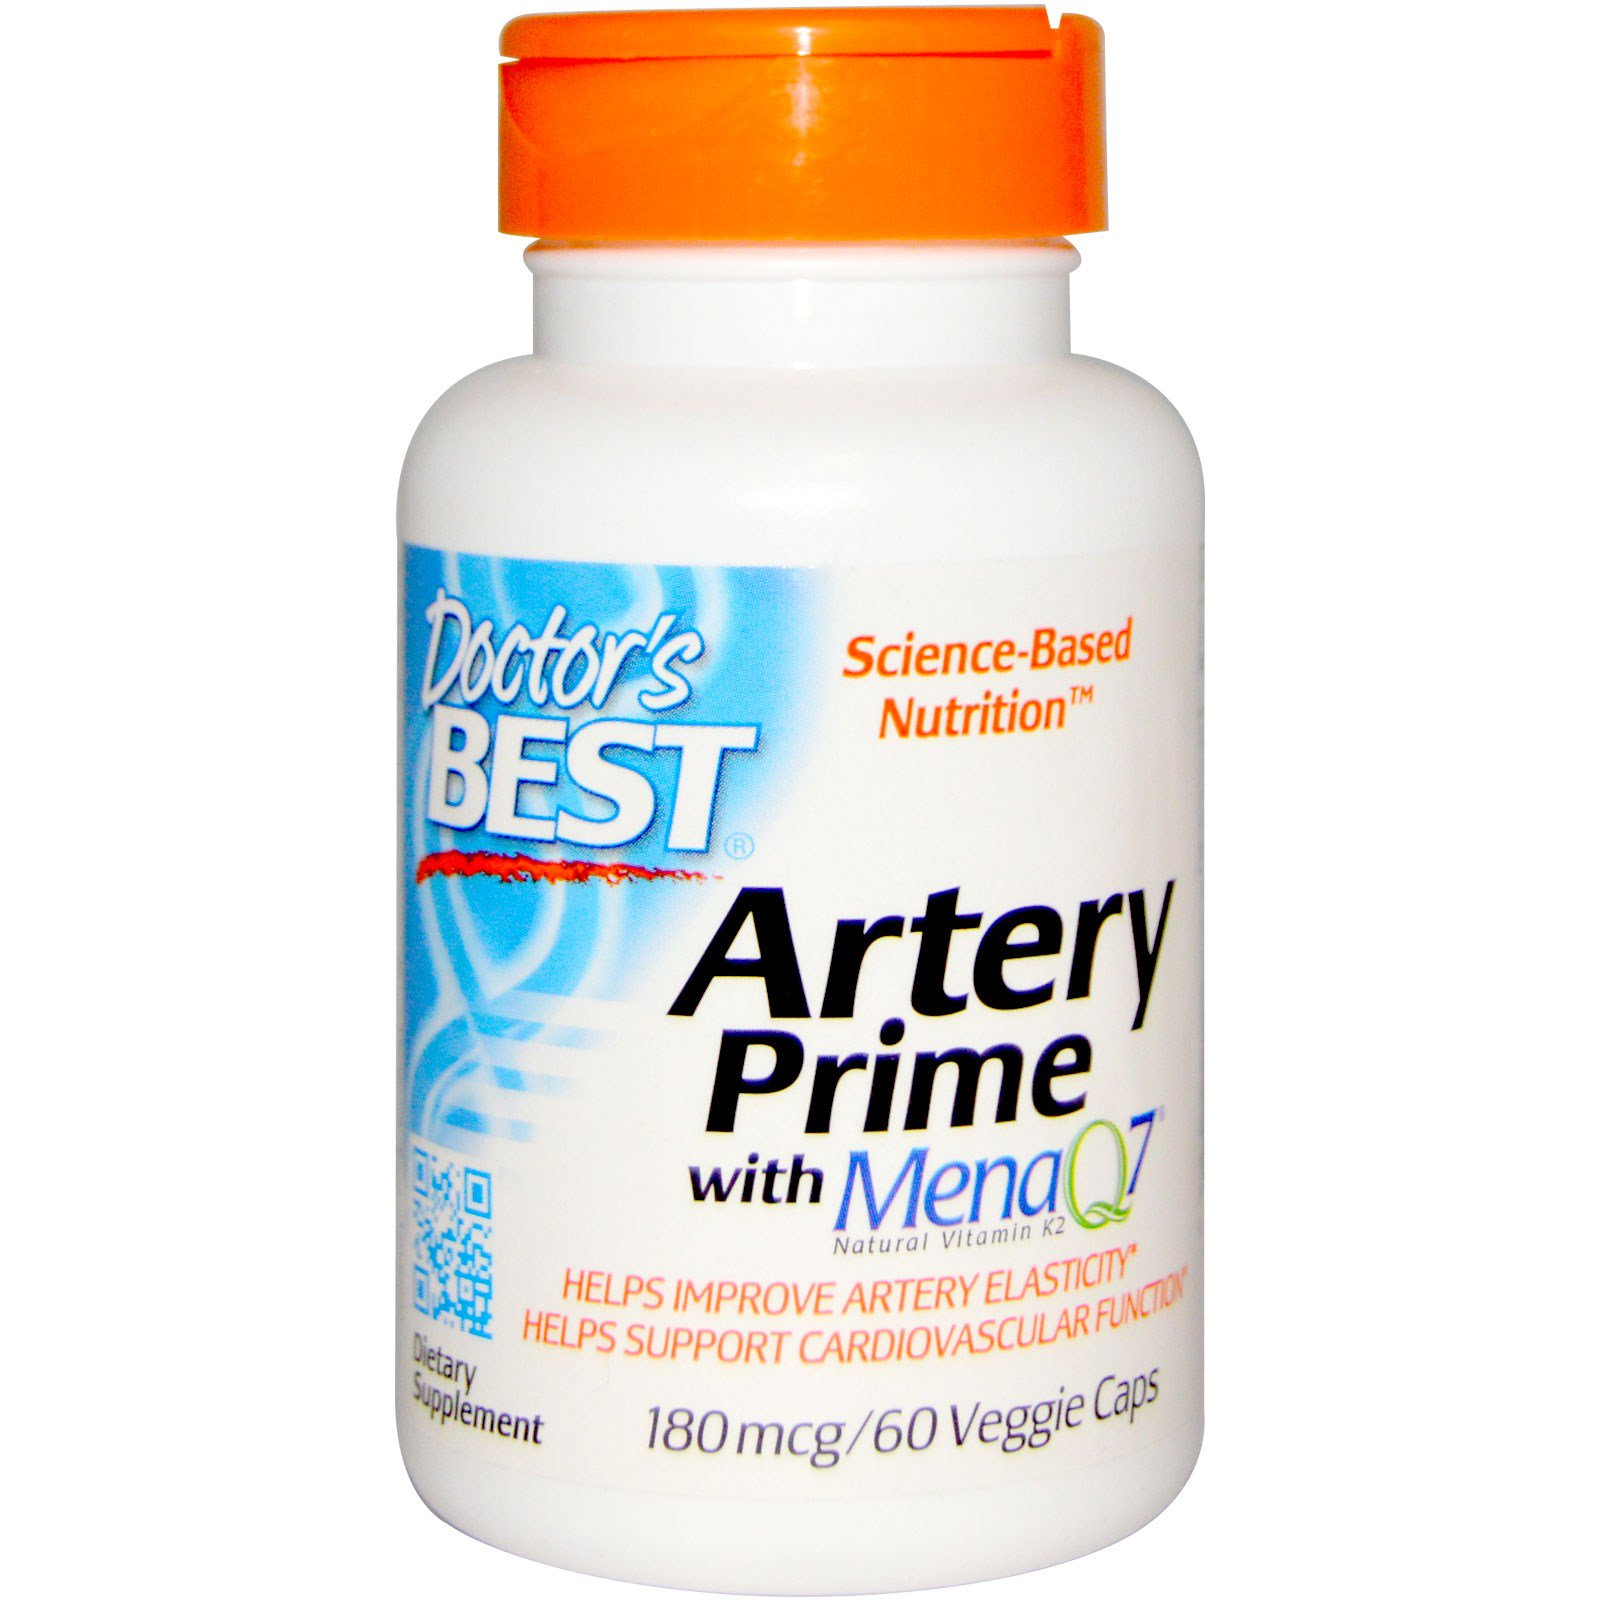 Doctor's Best, Artery Prime with Mena Q7, 180mcg, 60 Veggie Caps